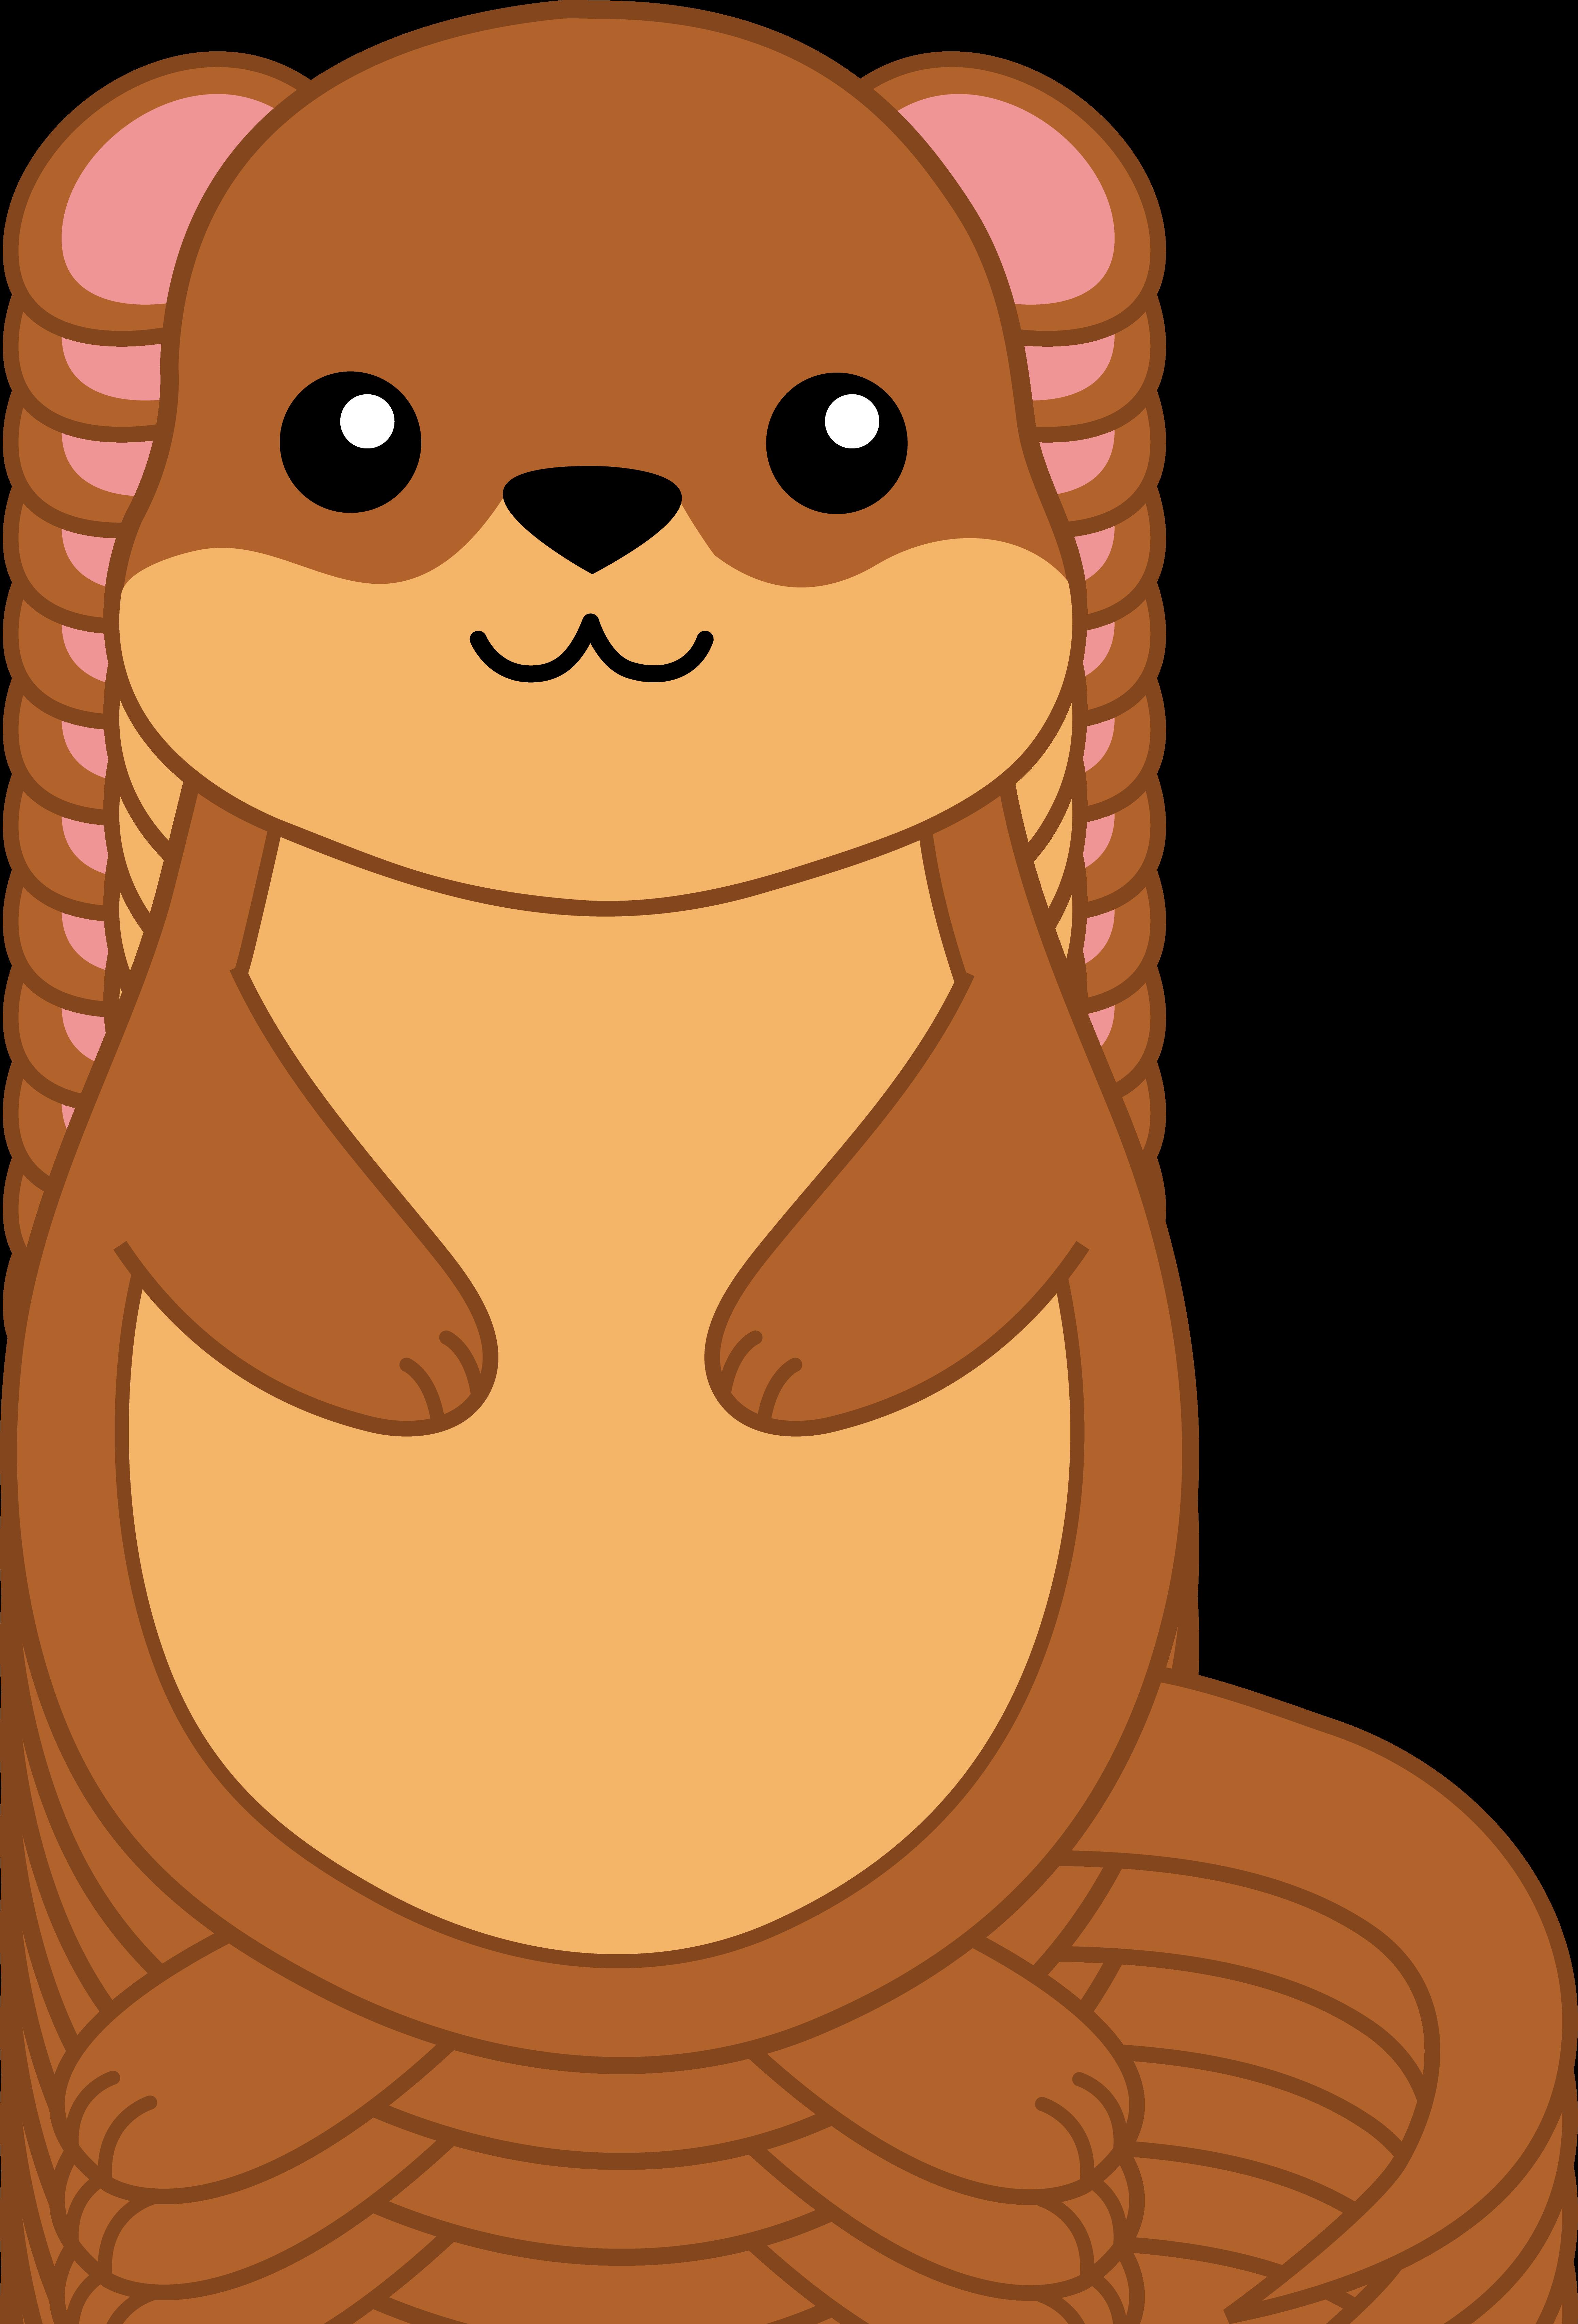 Groundhog cartoon clipart svg freeuse stock Free Groundhog Cliparts, Download Free Clip Art, Free Clip Art on ... svg freeuse stock